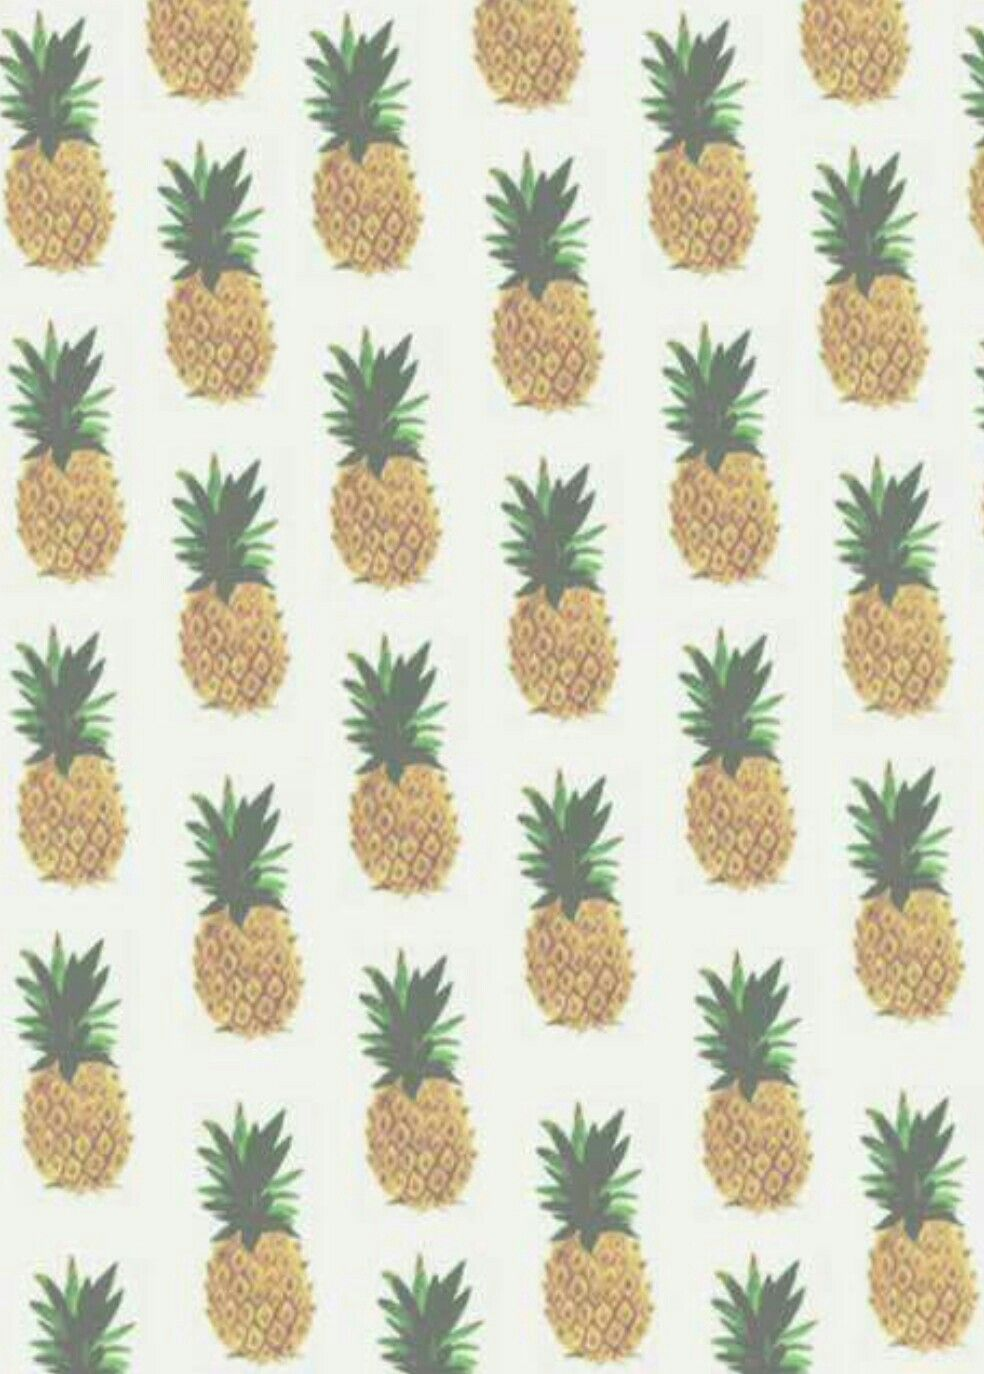 pineapples #wallpaper #cute | wallpapers | Pinterest | Wallpaper ... for Cute Pineapple Wallpaper  150ifm